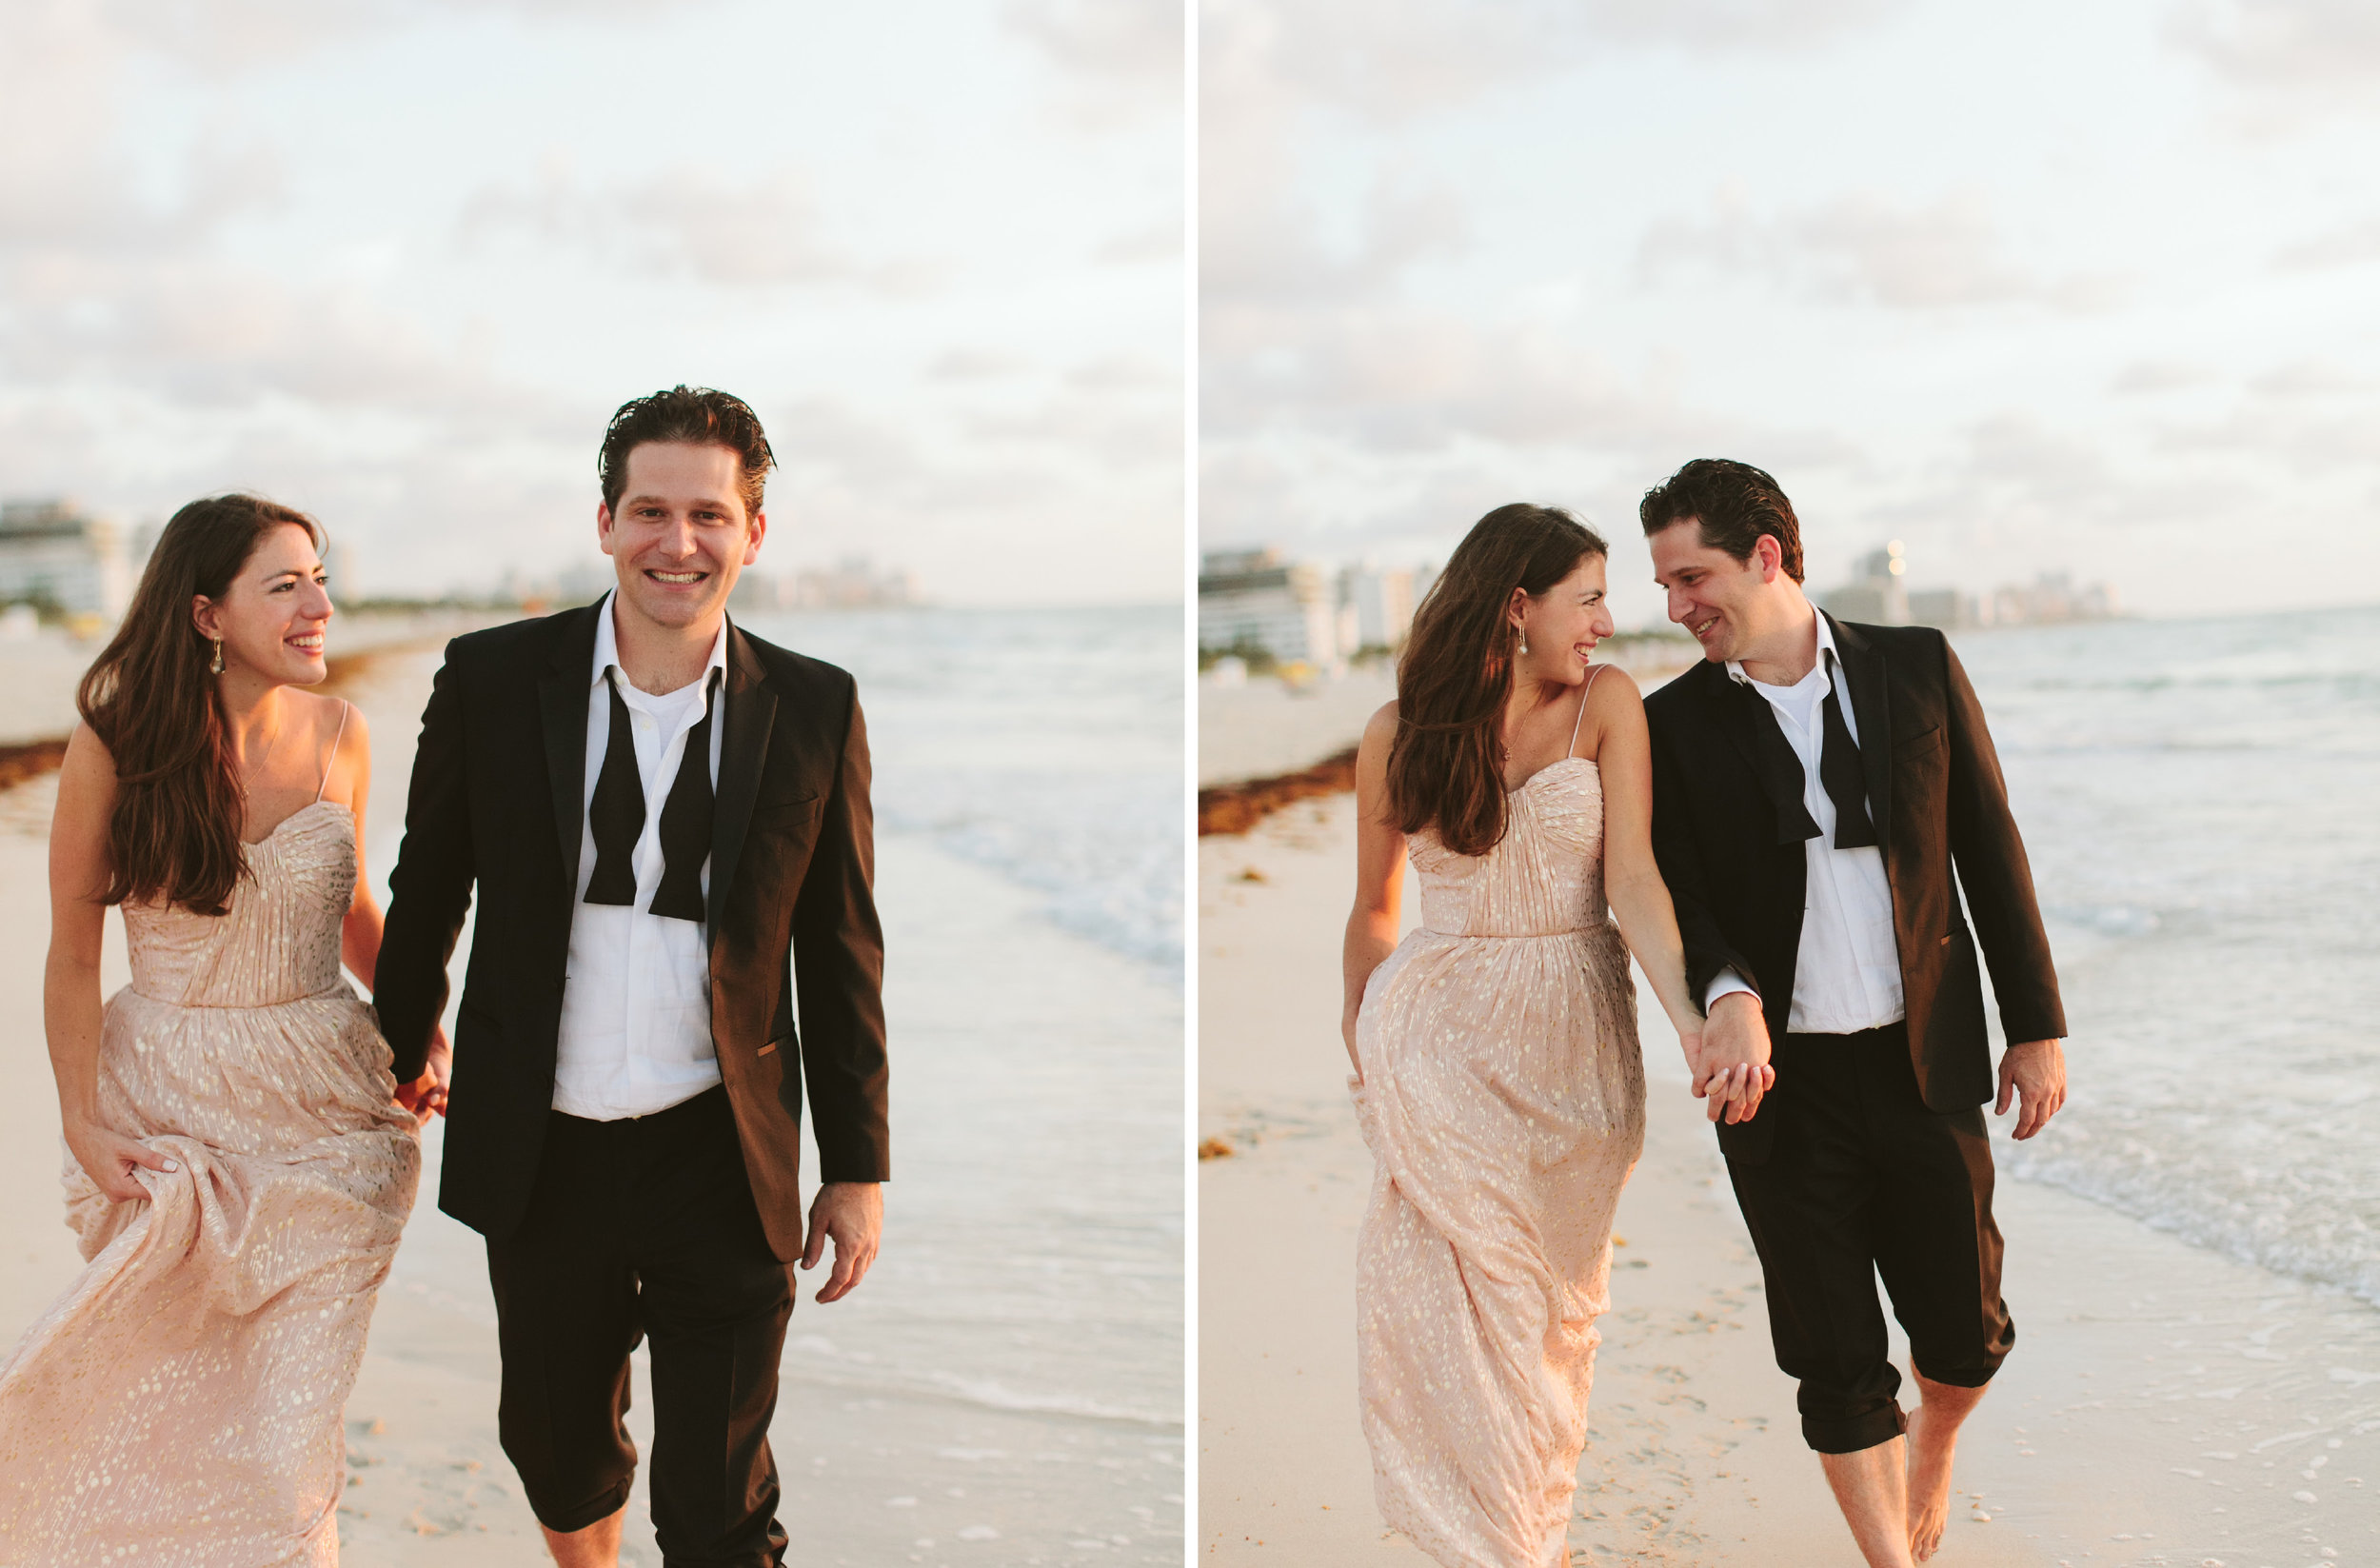 Meli + Mike South Pointe Park South Beach Miami Engagement Shoot22.jpg